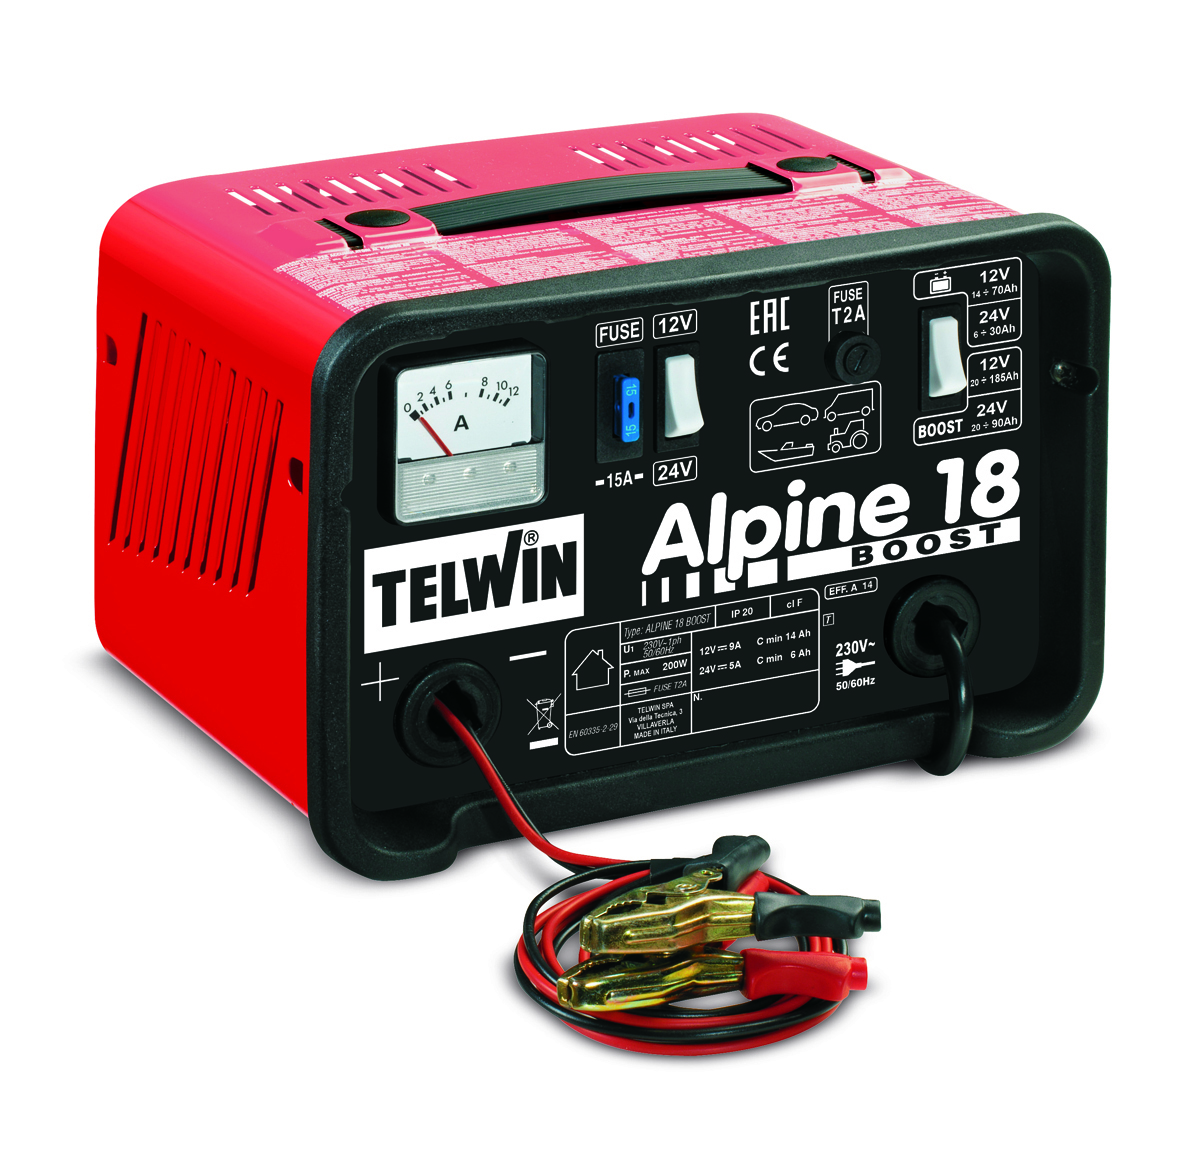 Зарядное устройство автомобильное TELWIN ALPINE 18 BOOST 12-24В